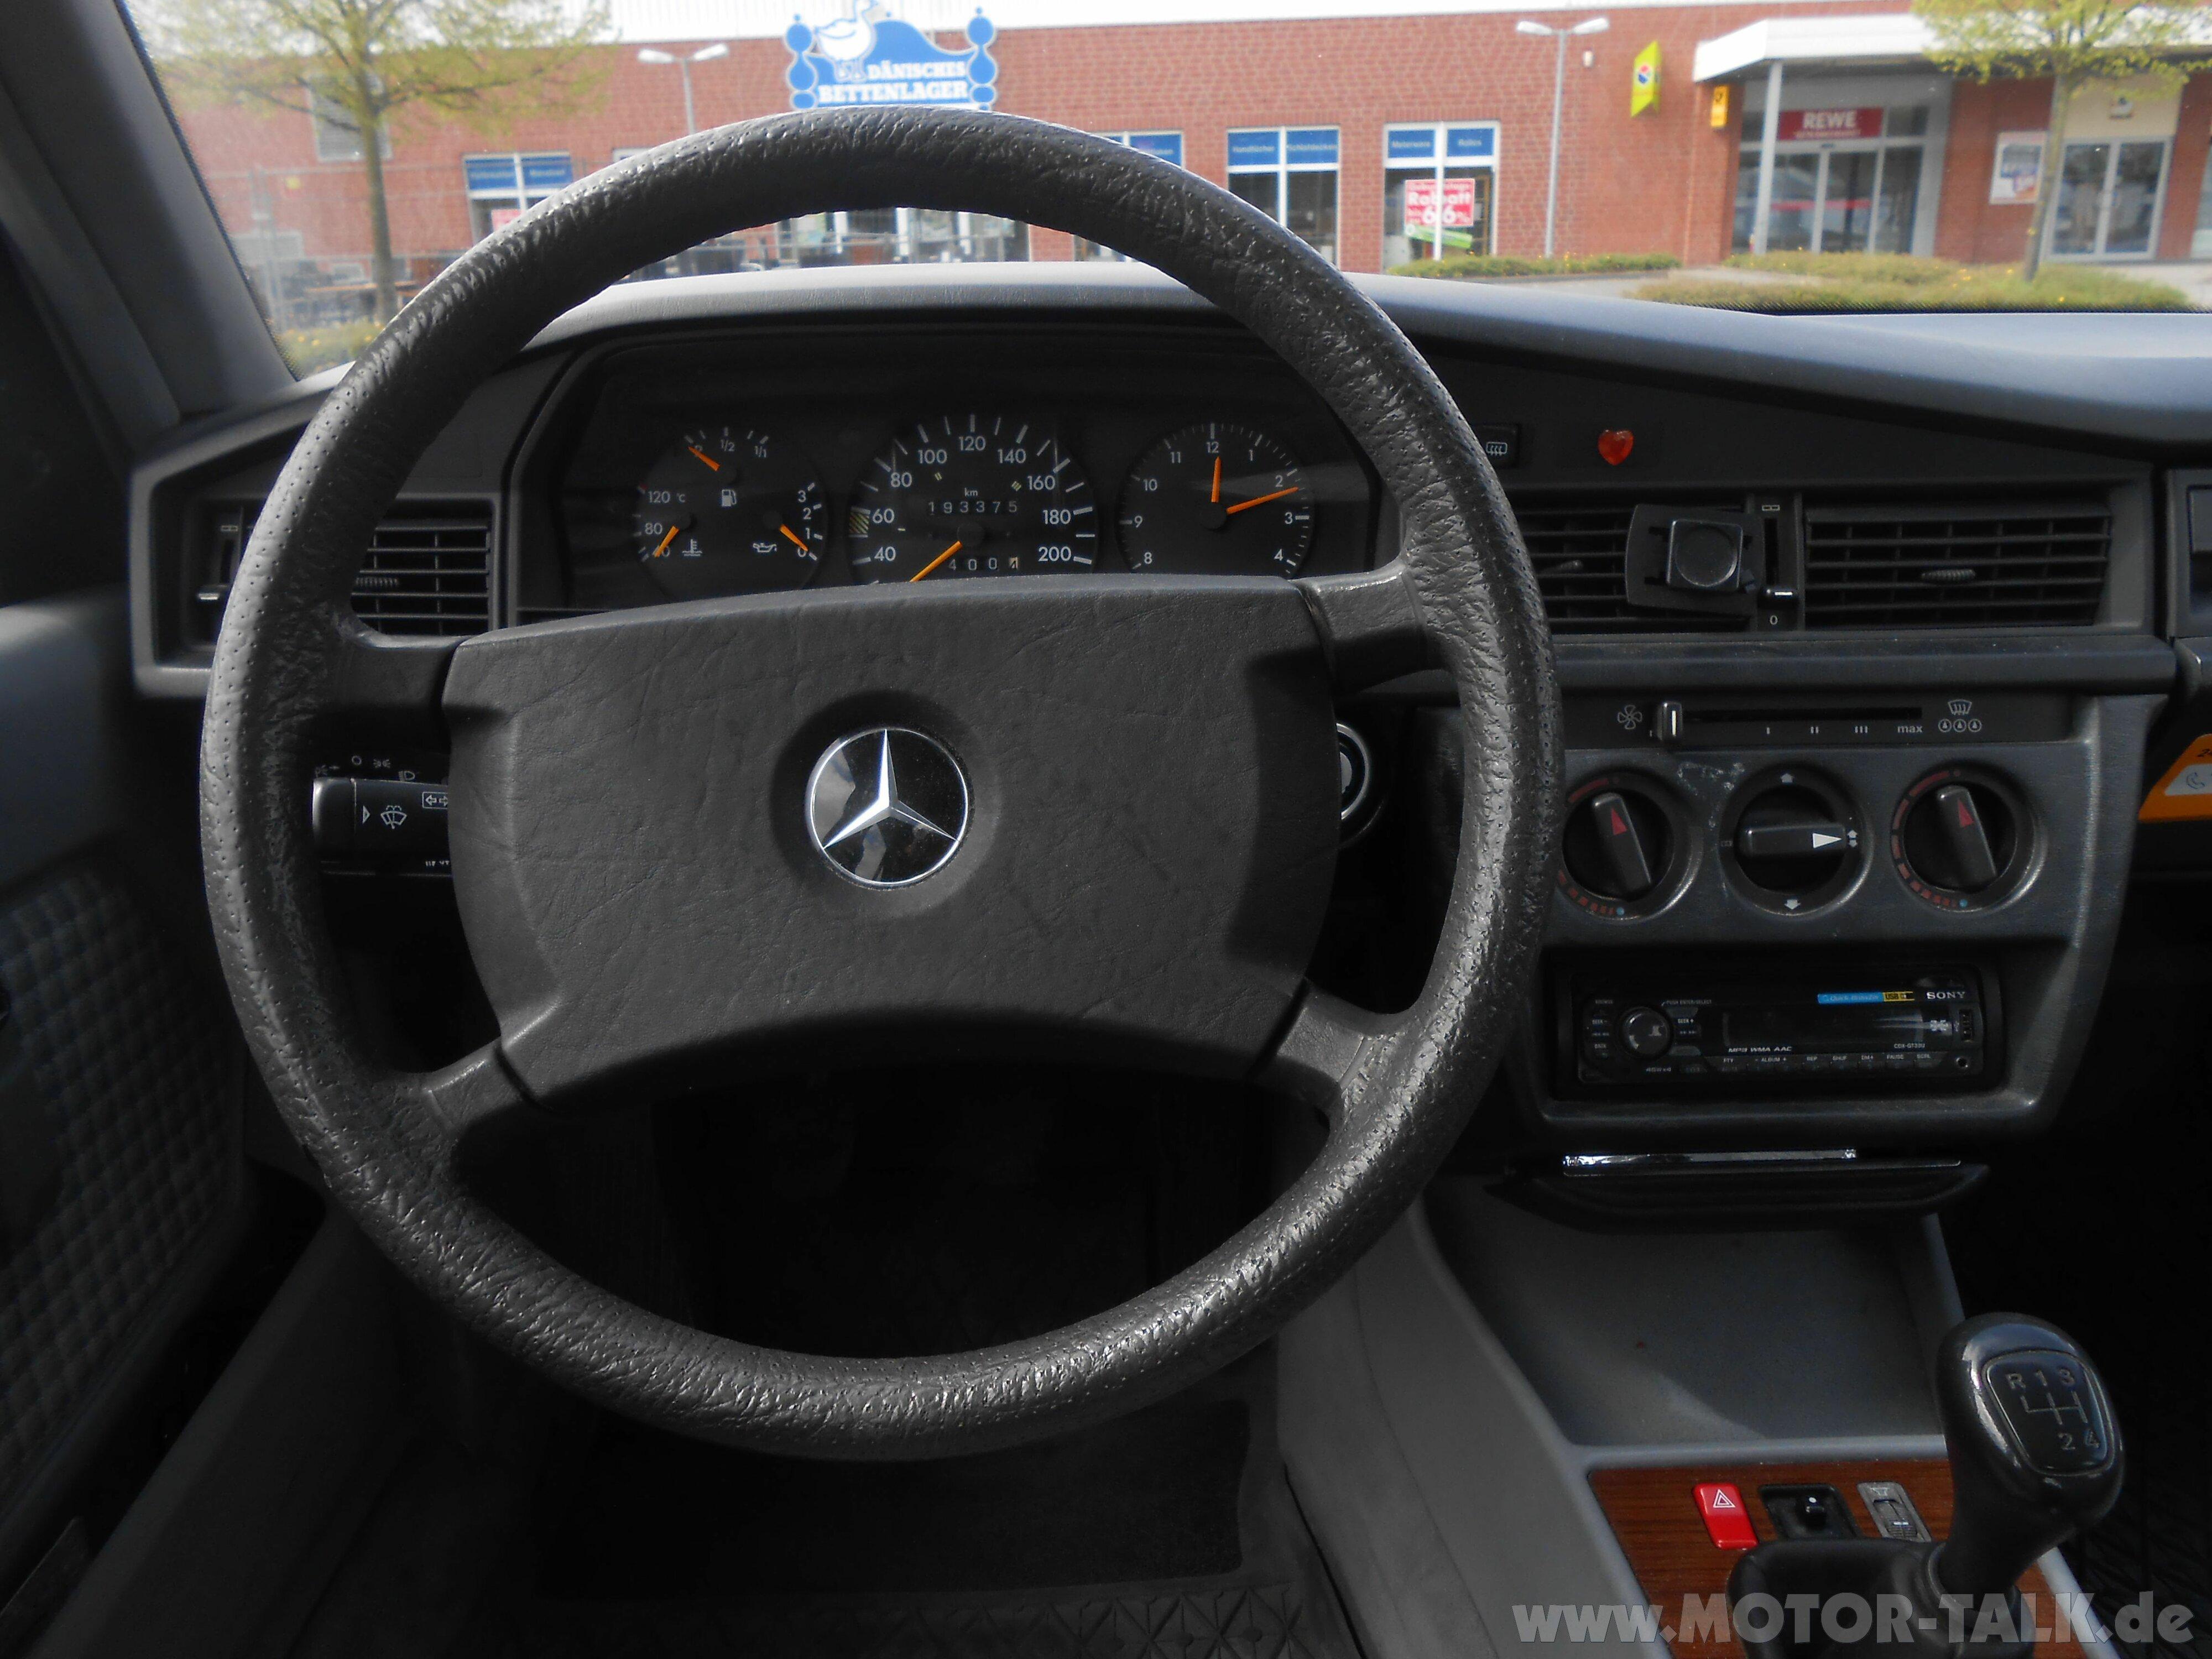 cockpit1-8399085552875743764.jpg